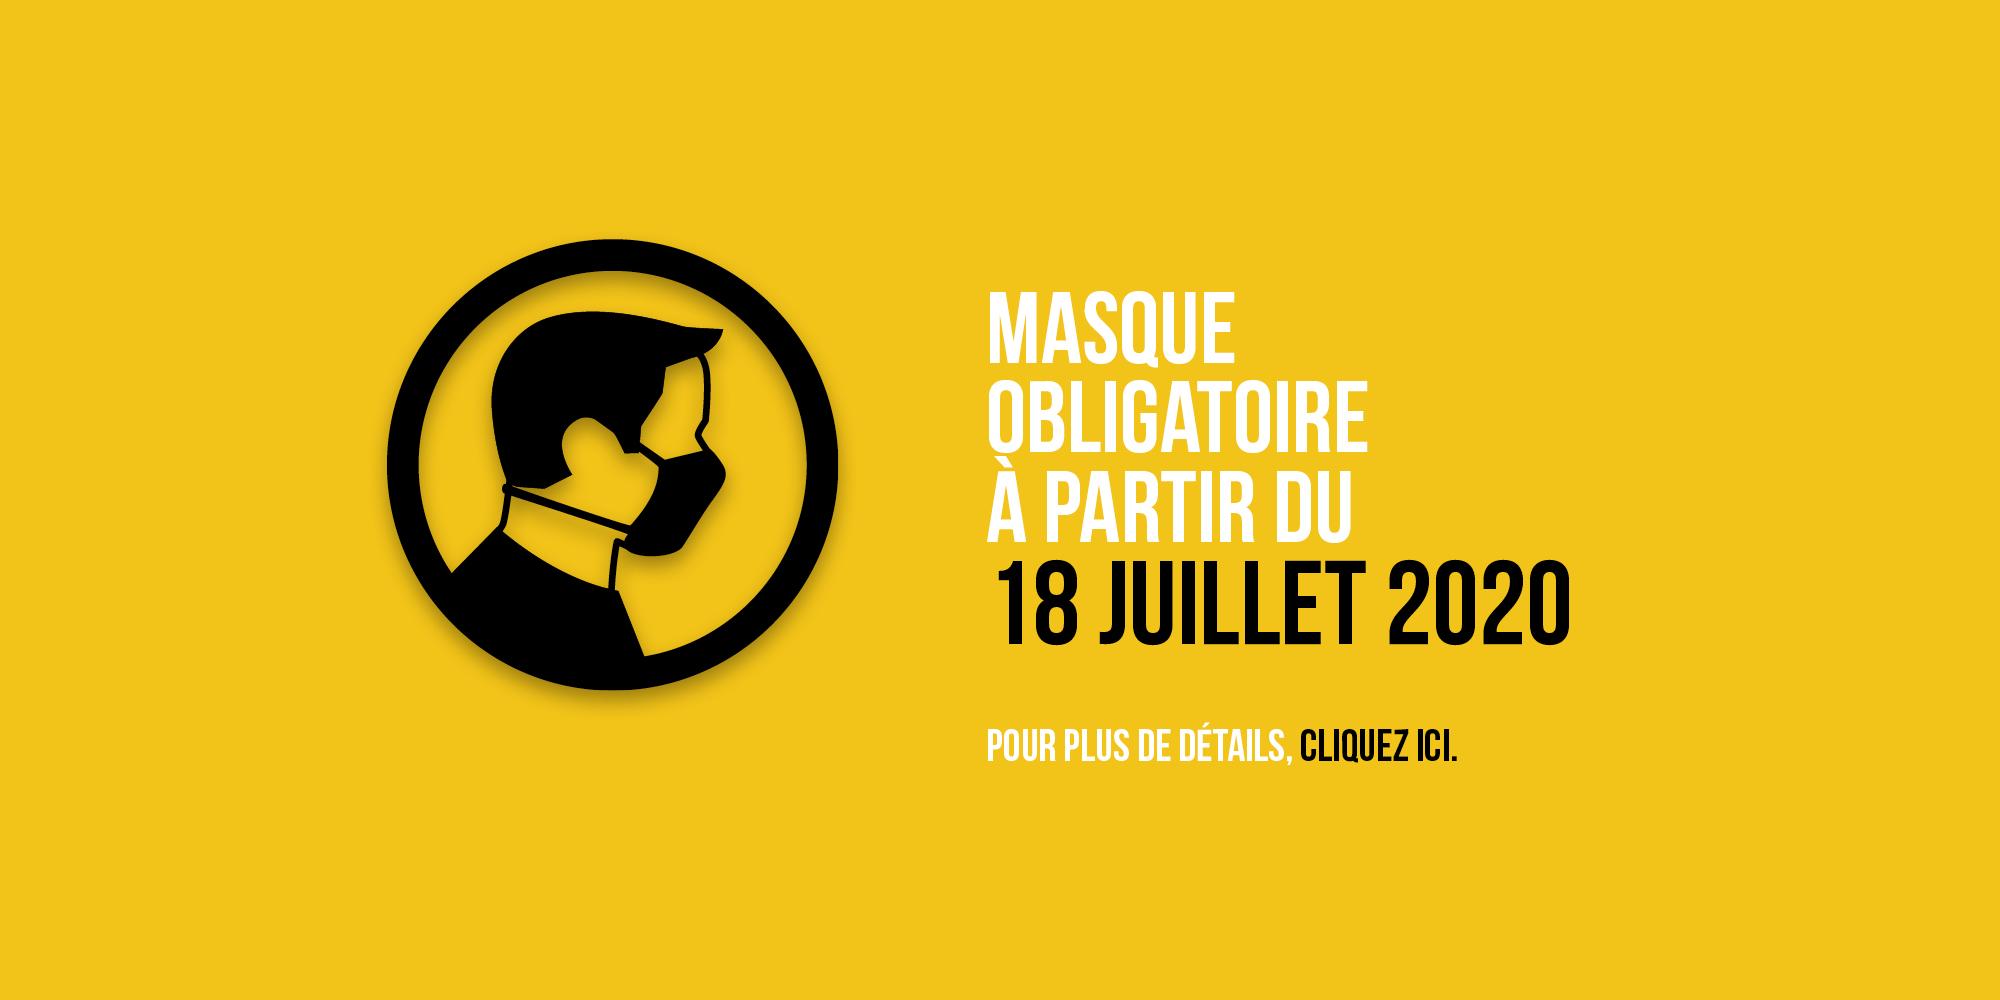 ap_siteweb_masque_covid19_carrou_3